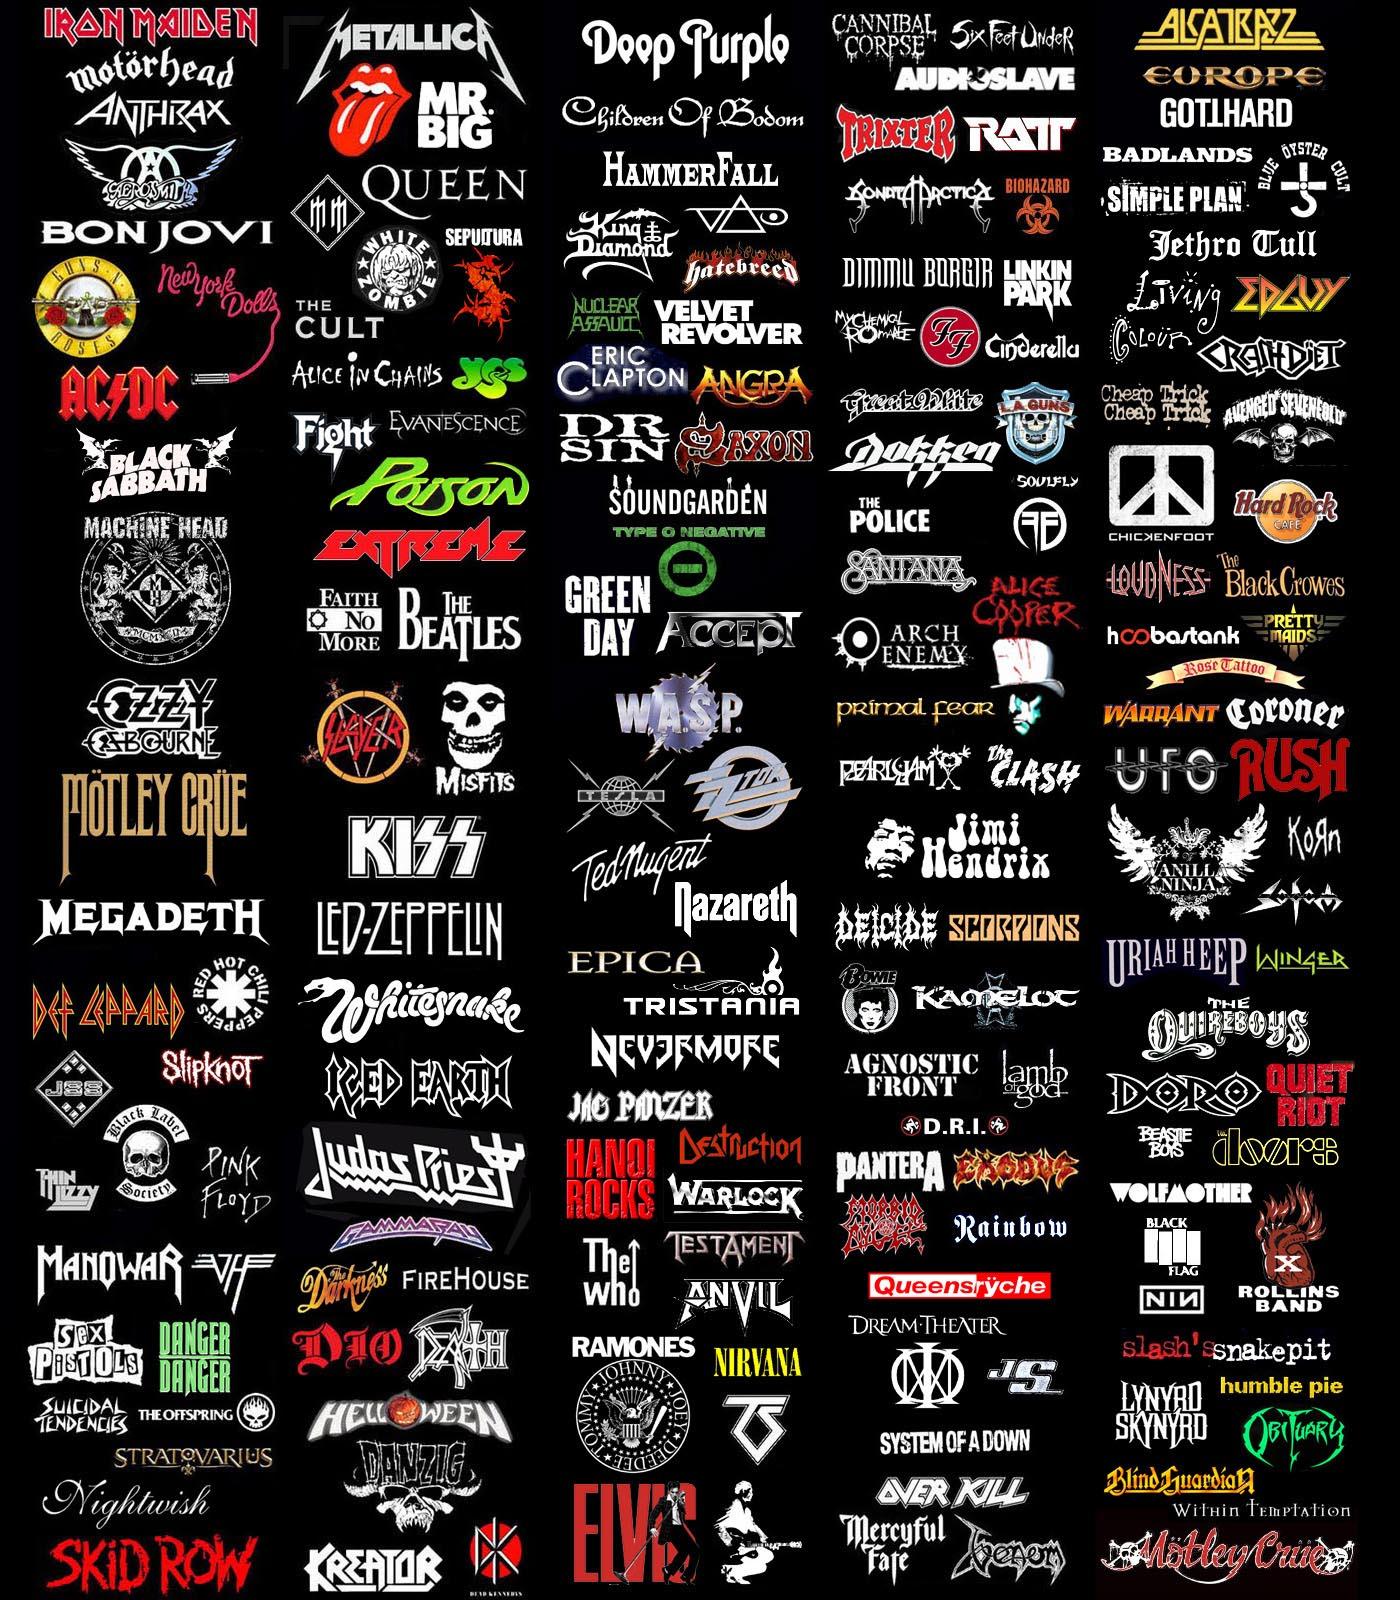 OnStage: Hard Rock - Da Ascensão à Decadência